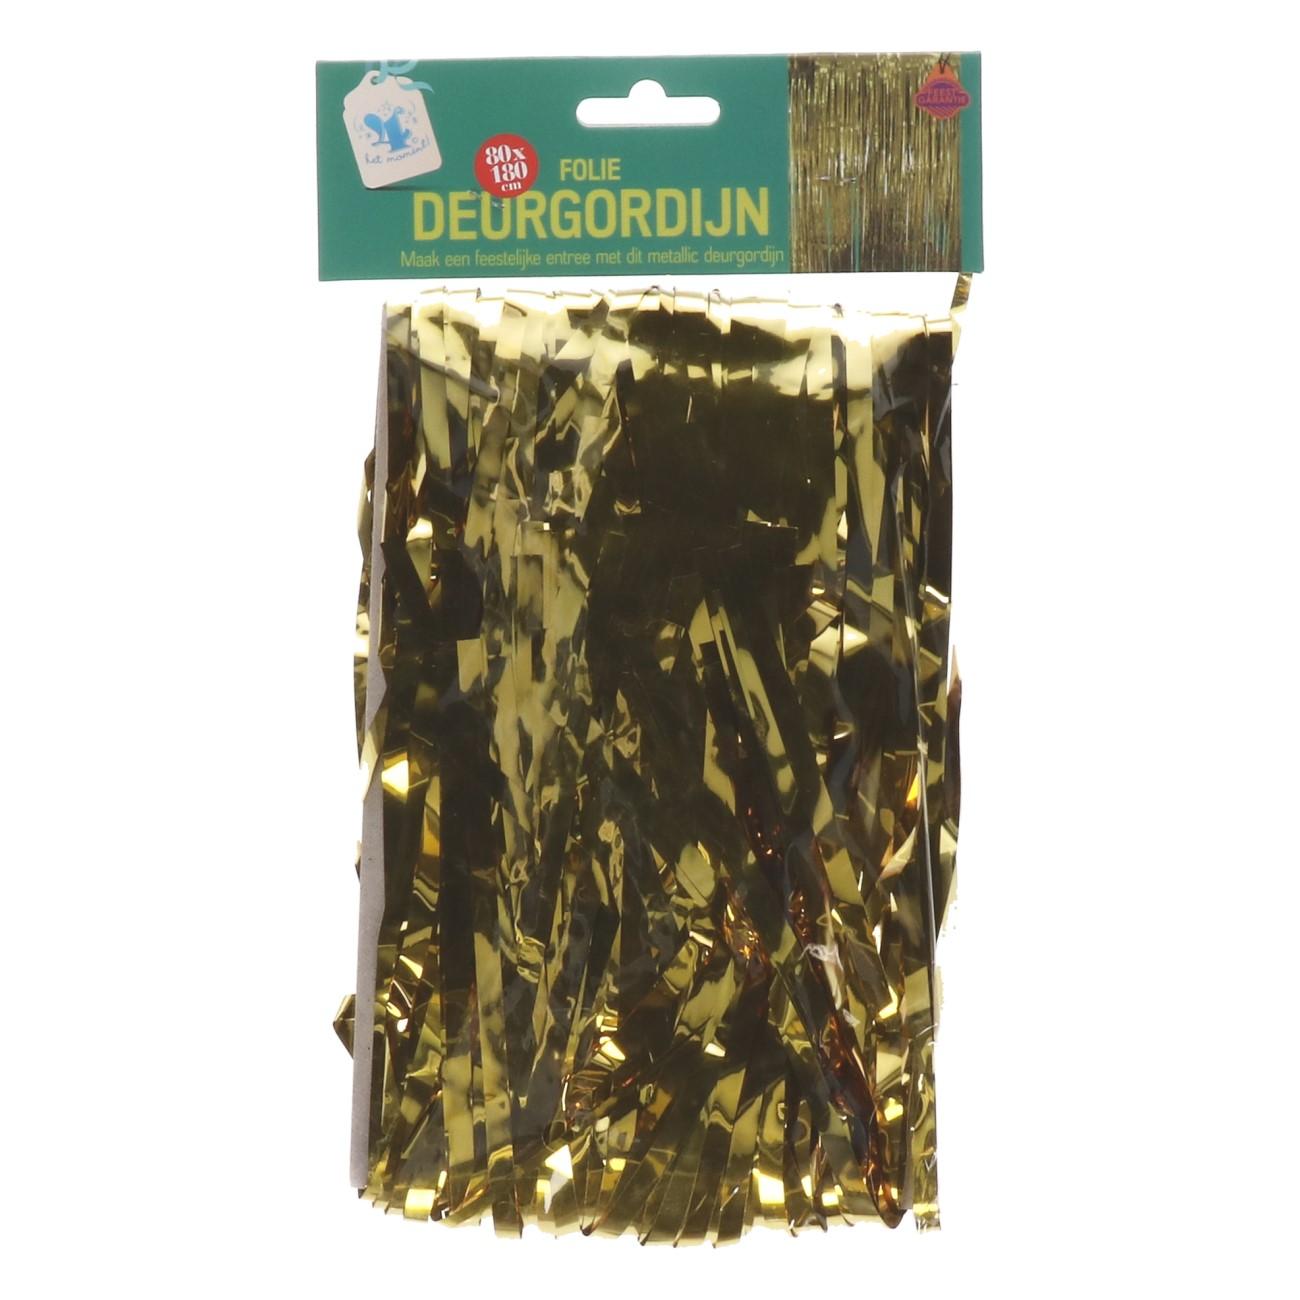 Deurgordijn folie 80*180cm goud